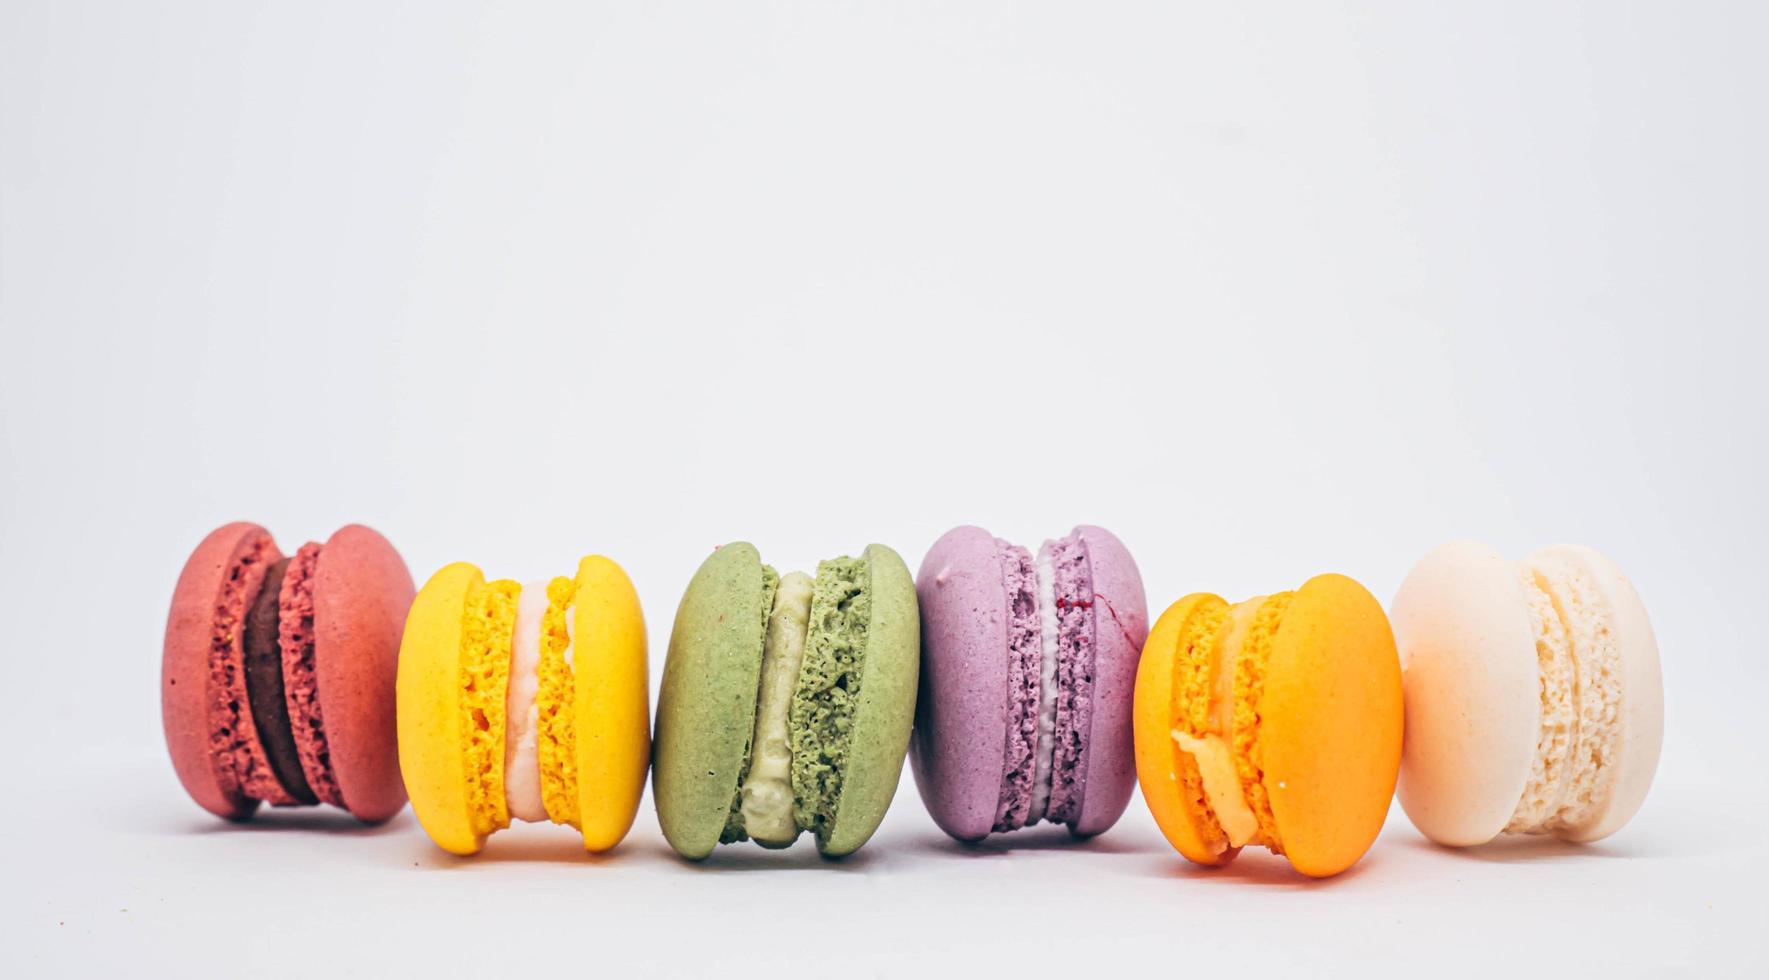 macarons color arcobaleno foto